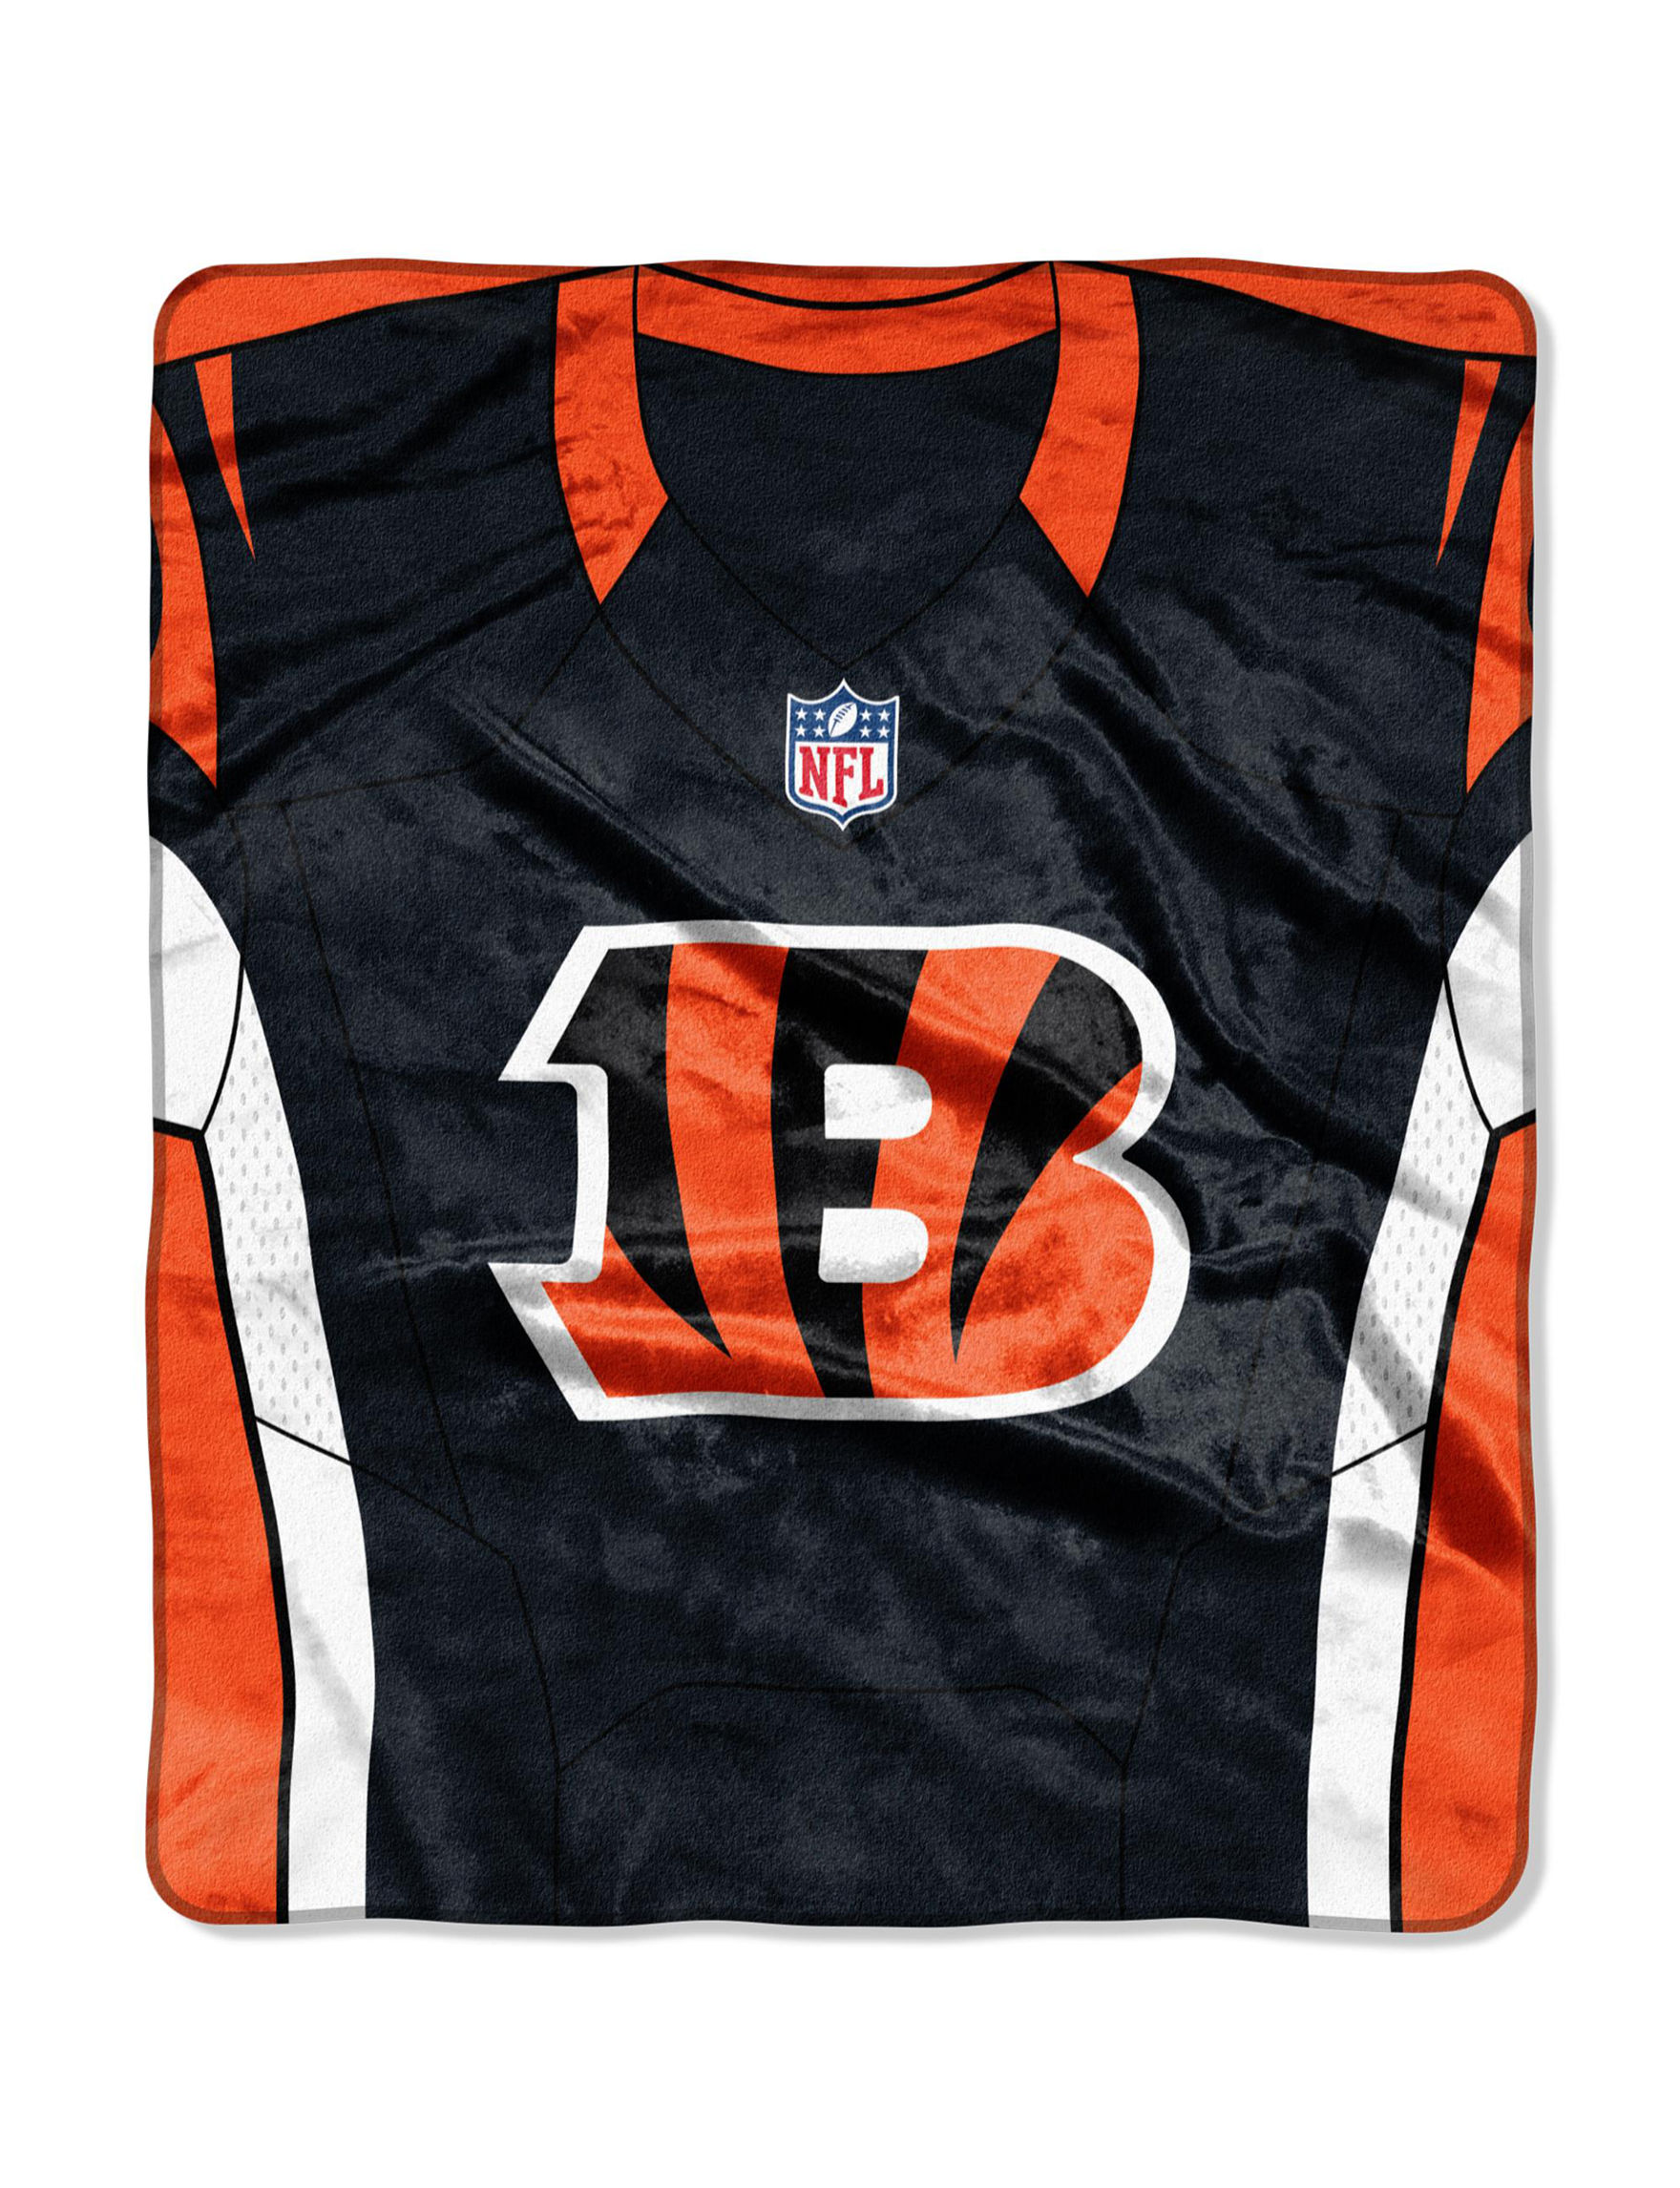 The Northwest Company Orange / Black Blankets & Throws